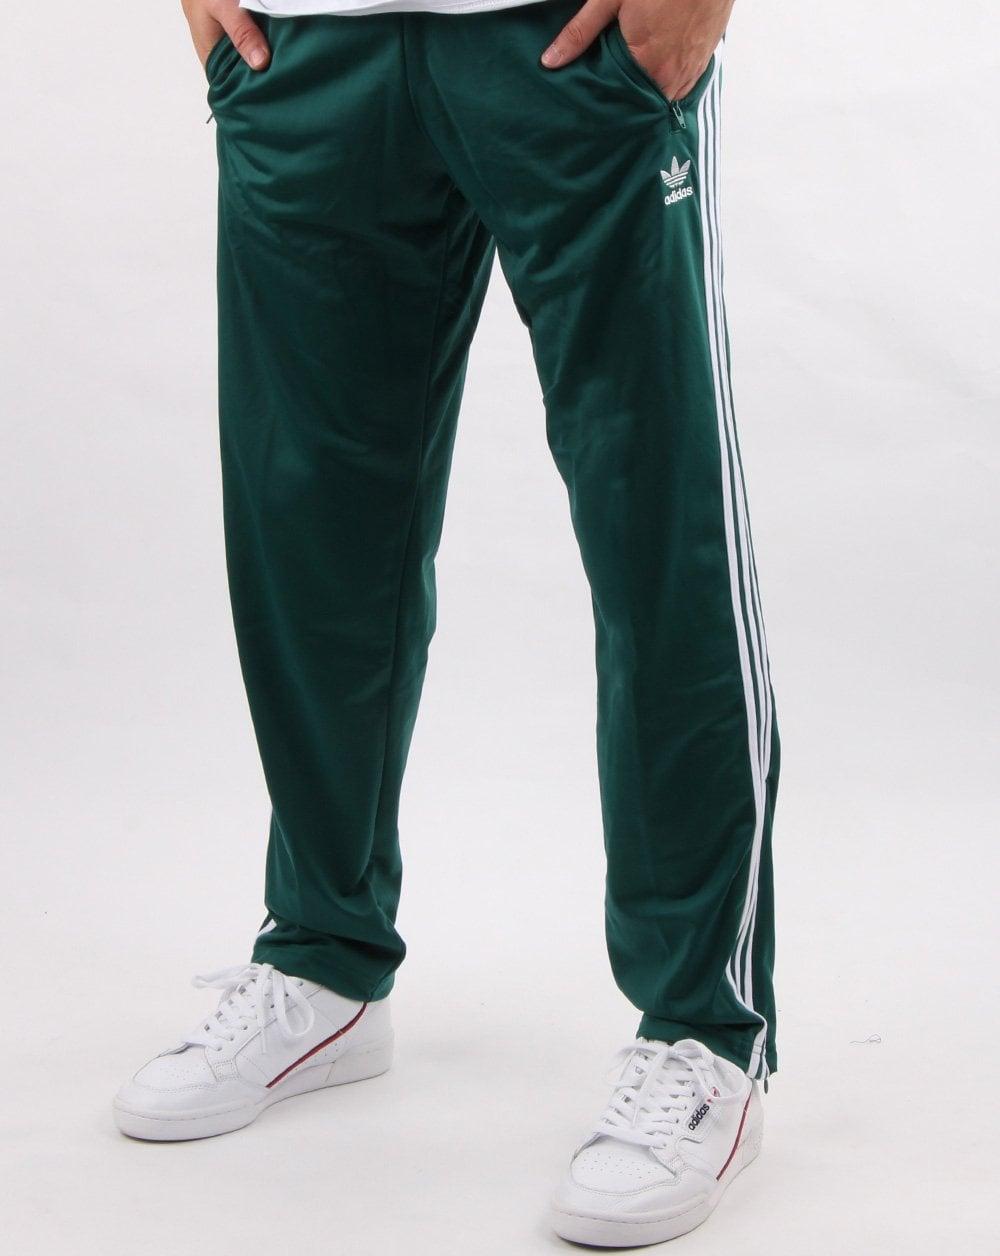 adidas originals firebird pants